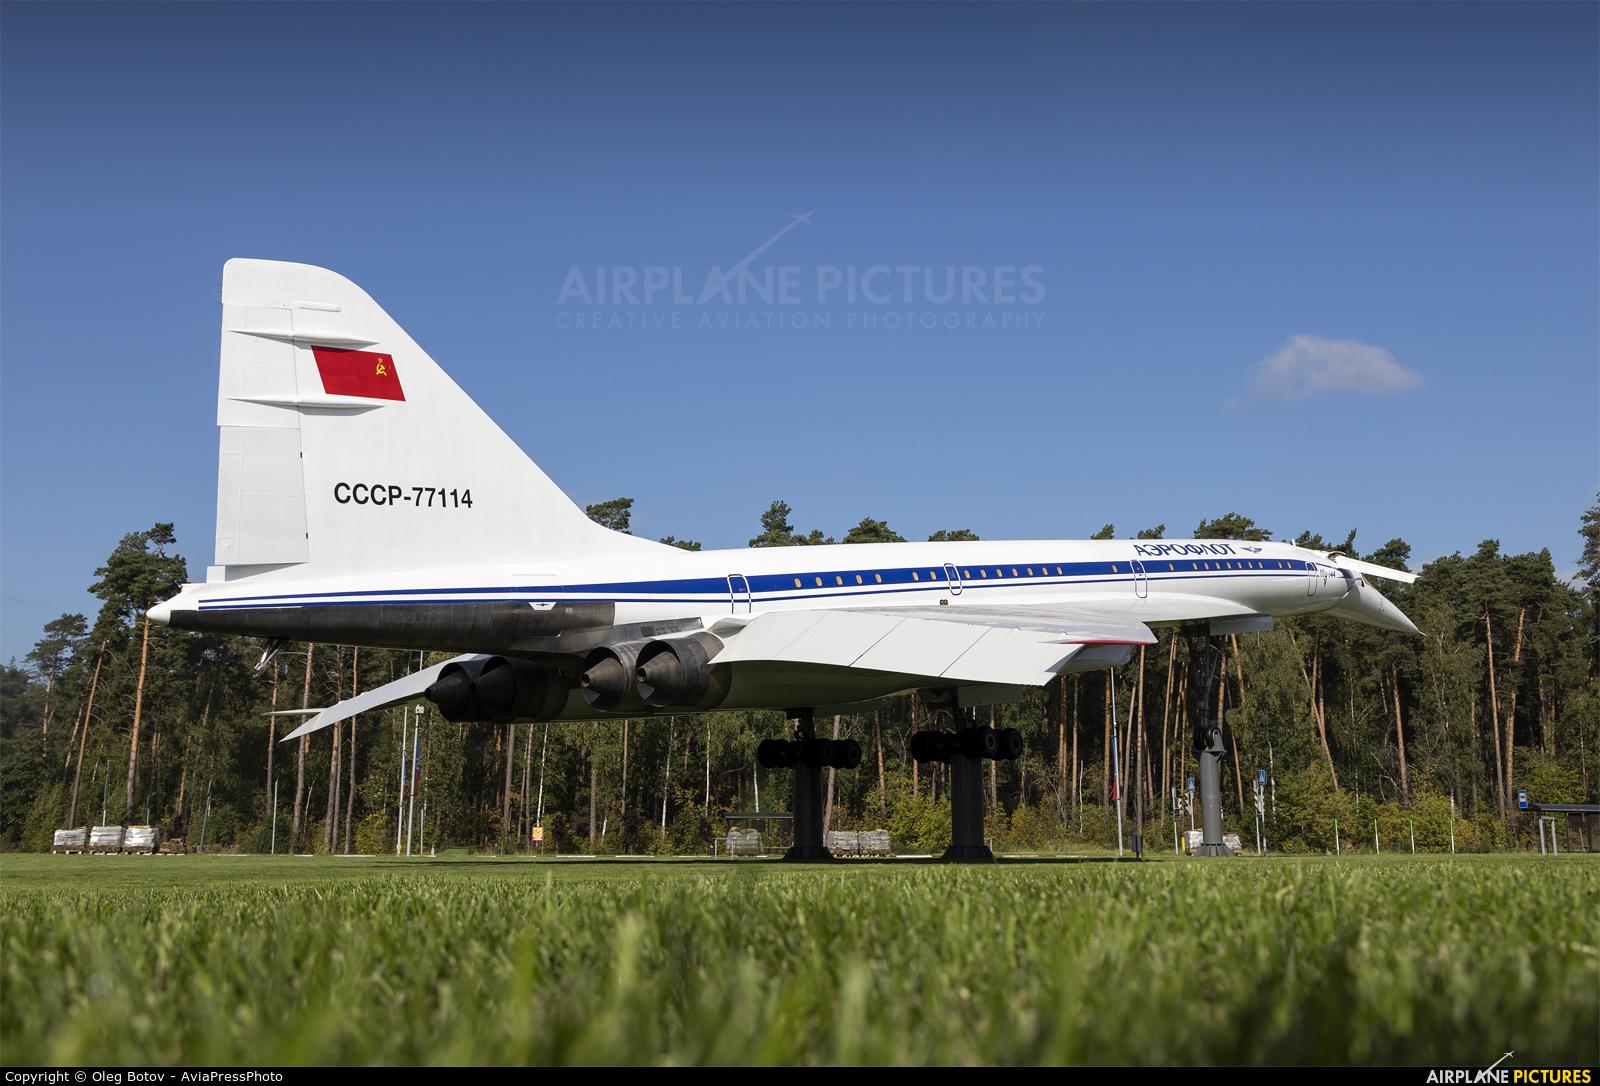 Aeroflot CCCP-77114 aircraft at Ramenskoye - Zhukovsky